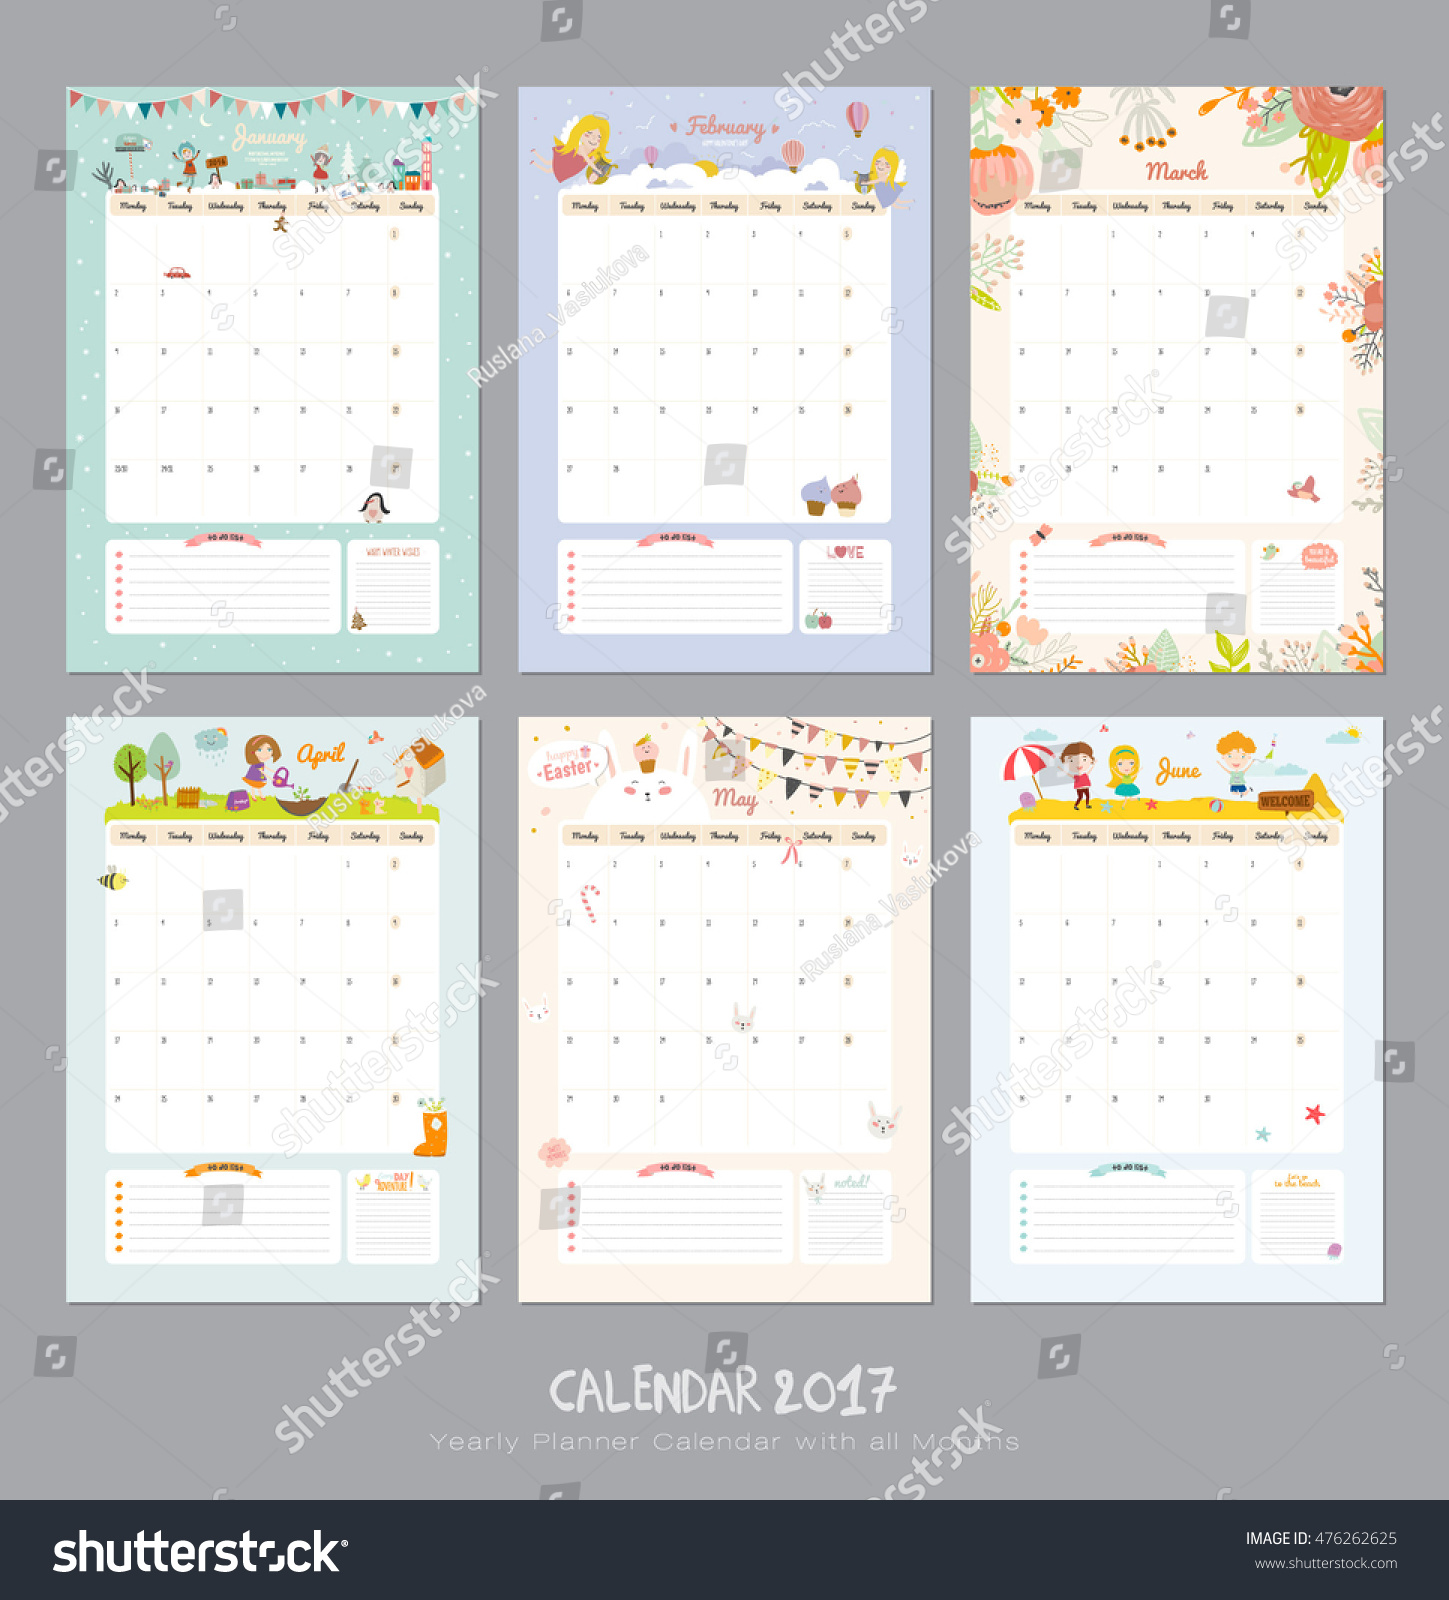 2017 yearly calendar printable